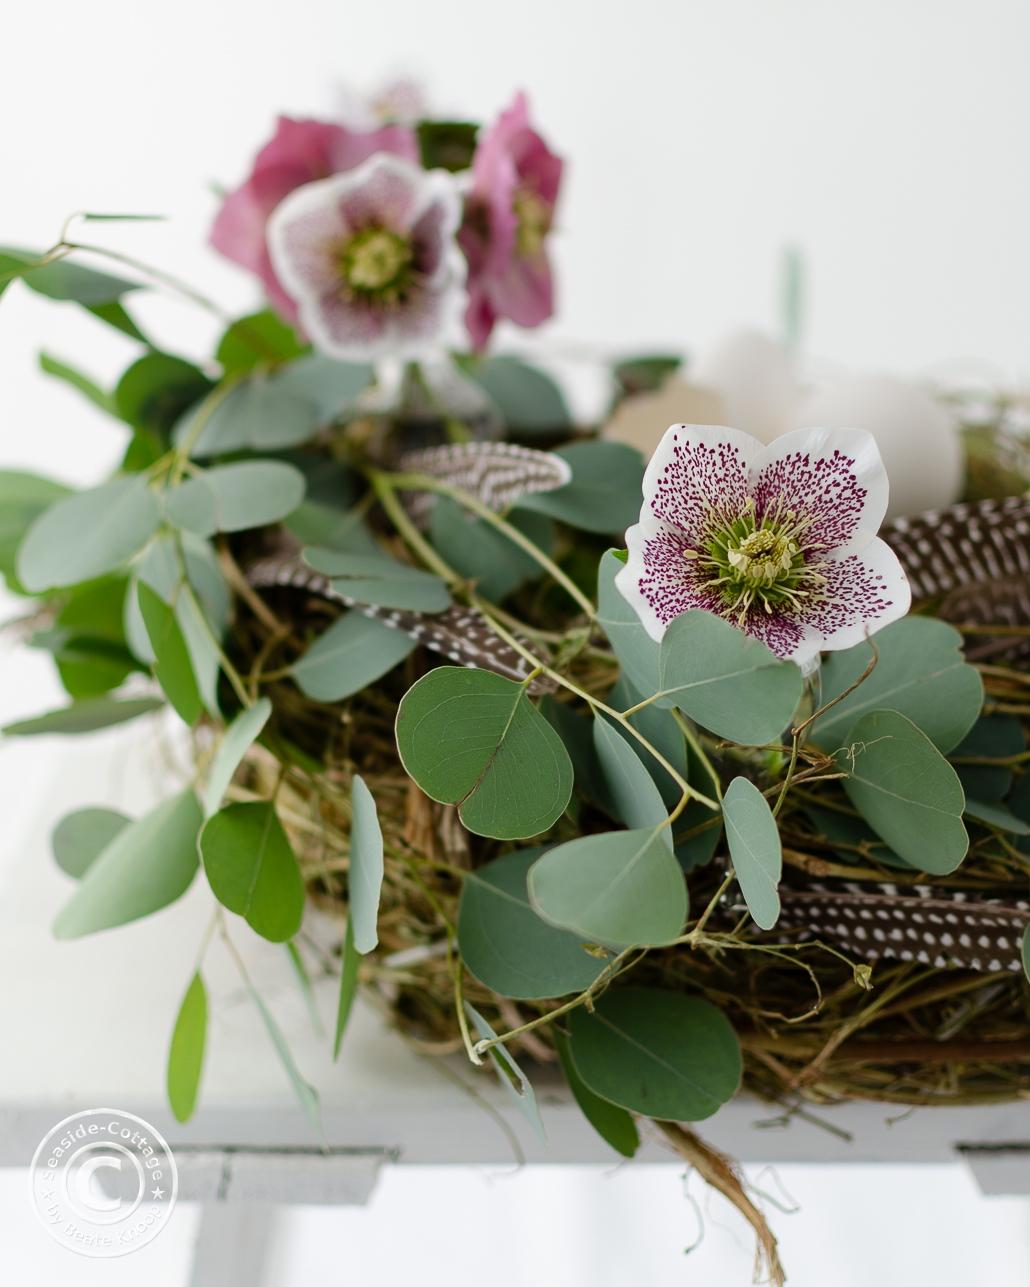 Lenzeosen und Eukalyptus